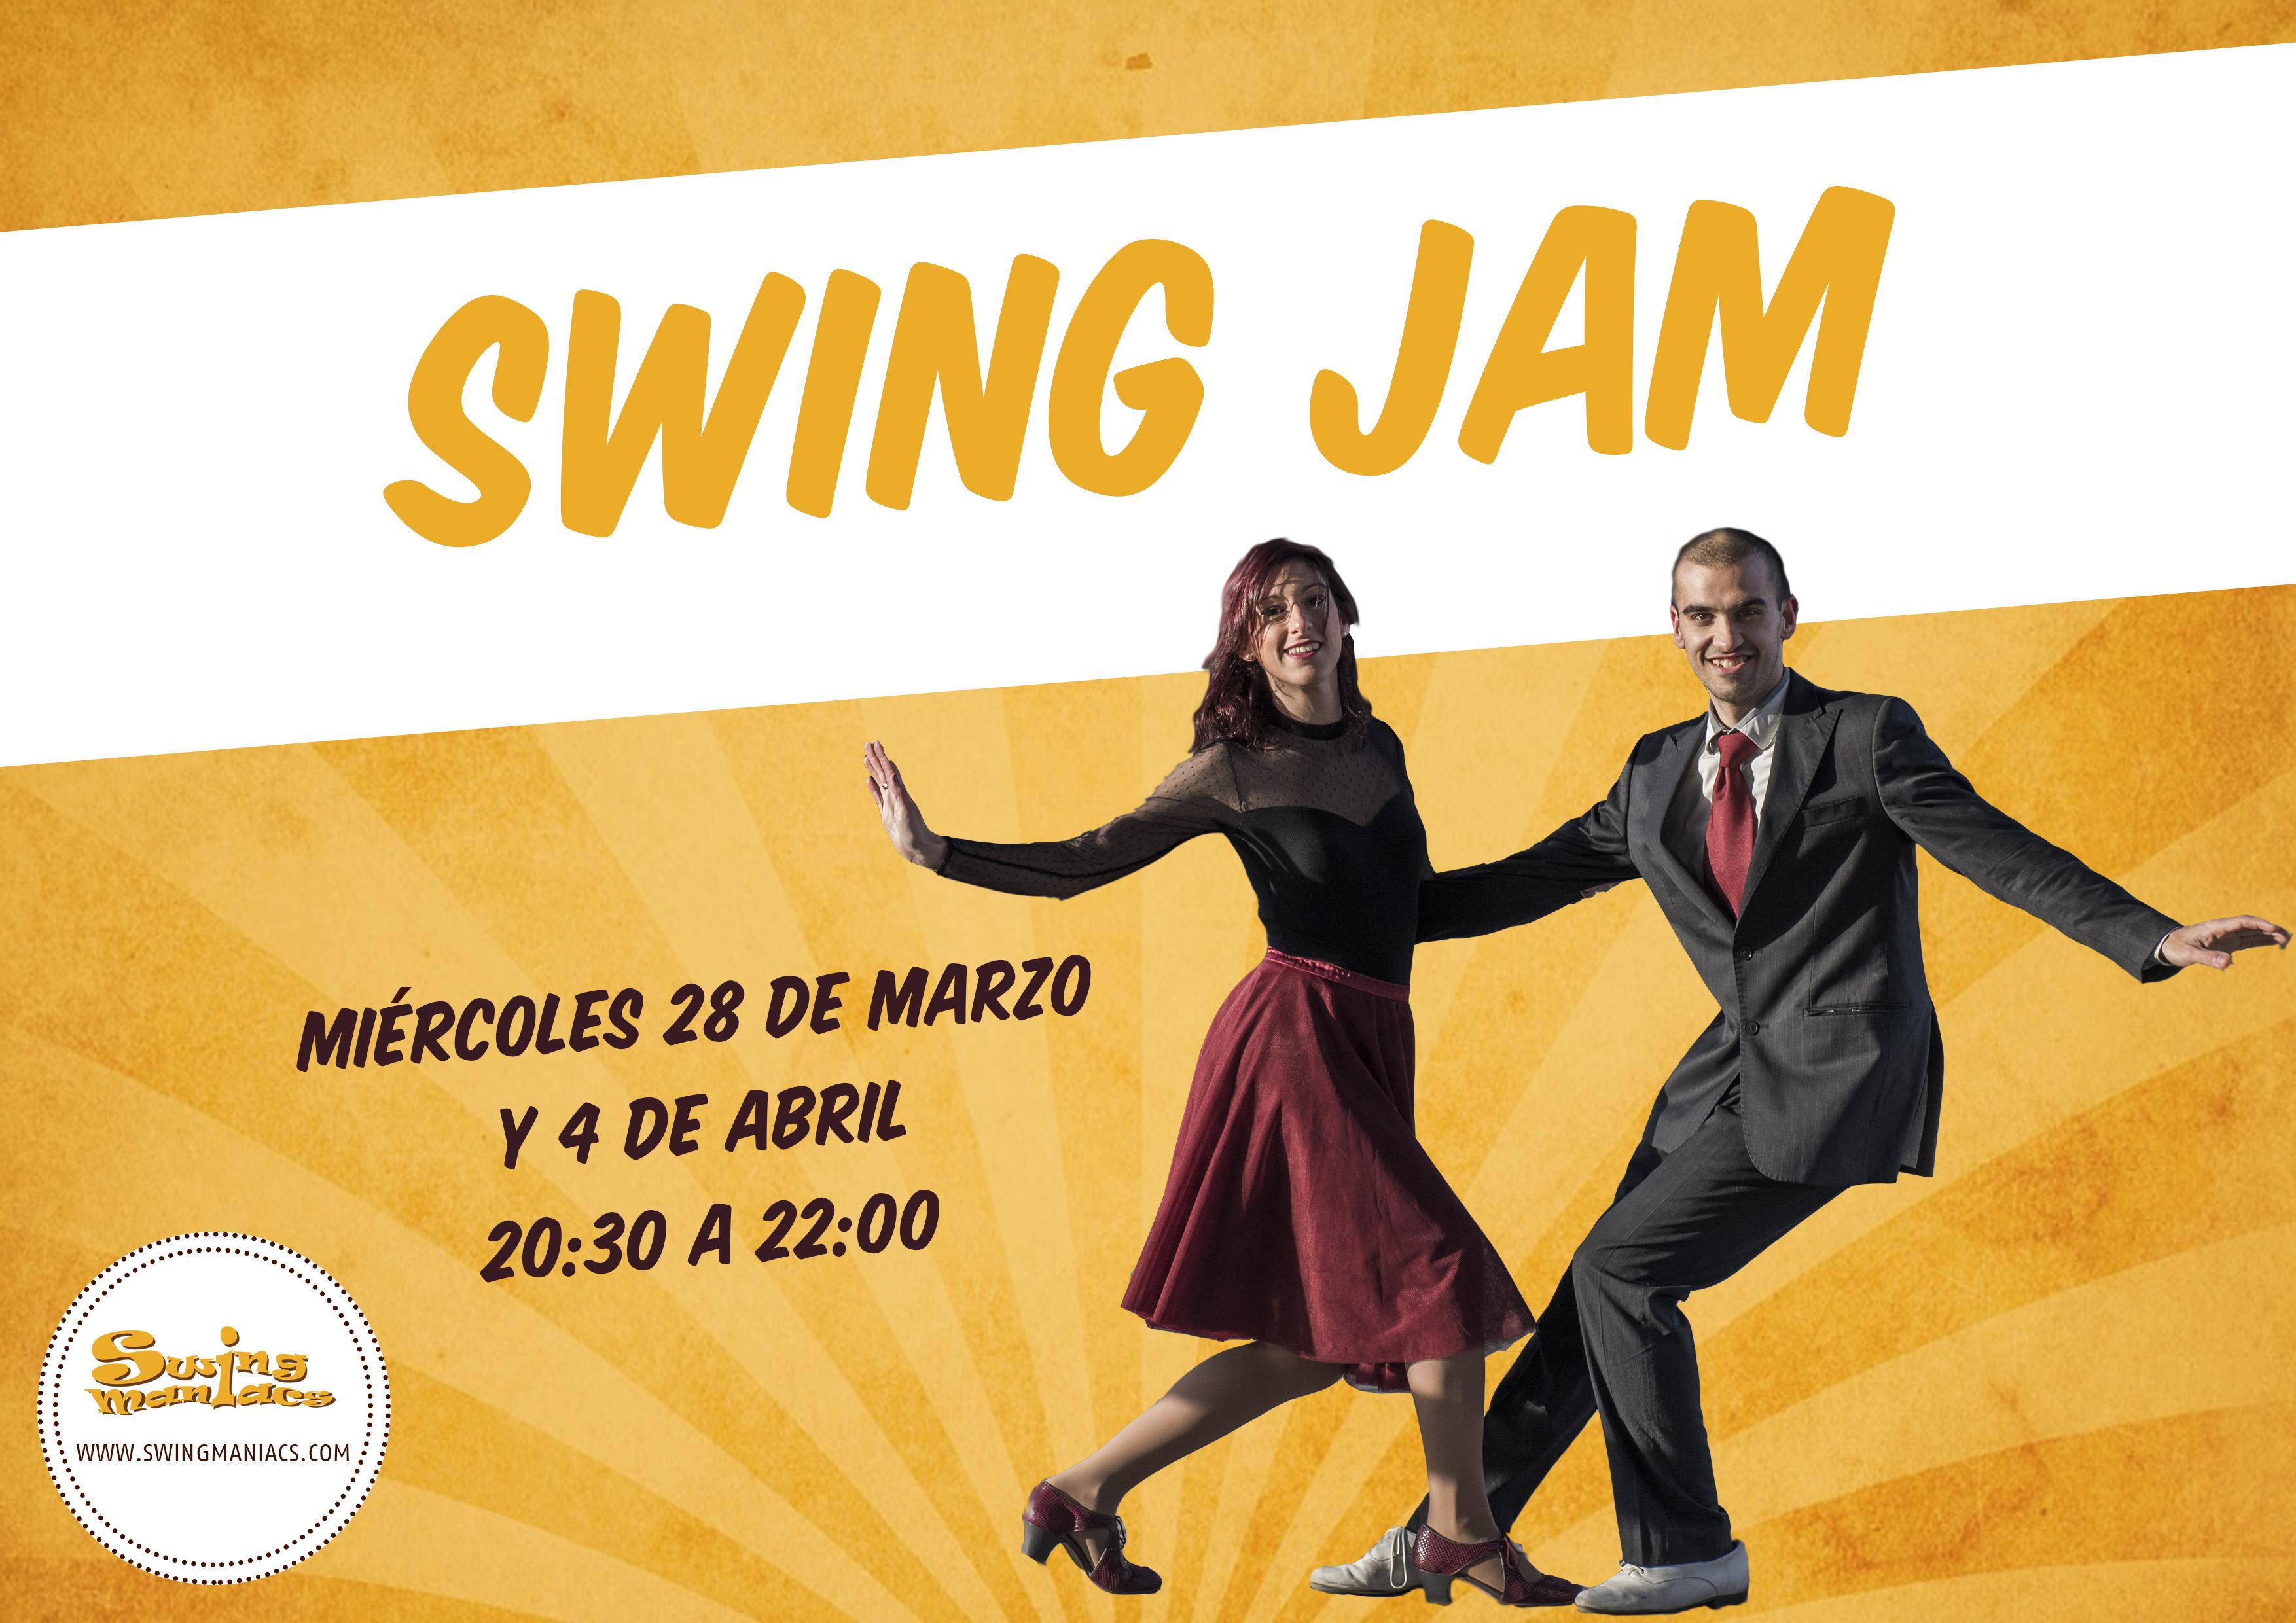 ¡MINI SWING JAM!